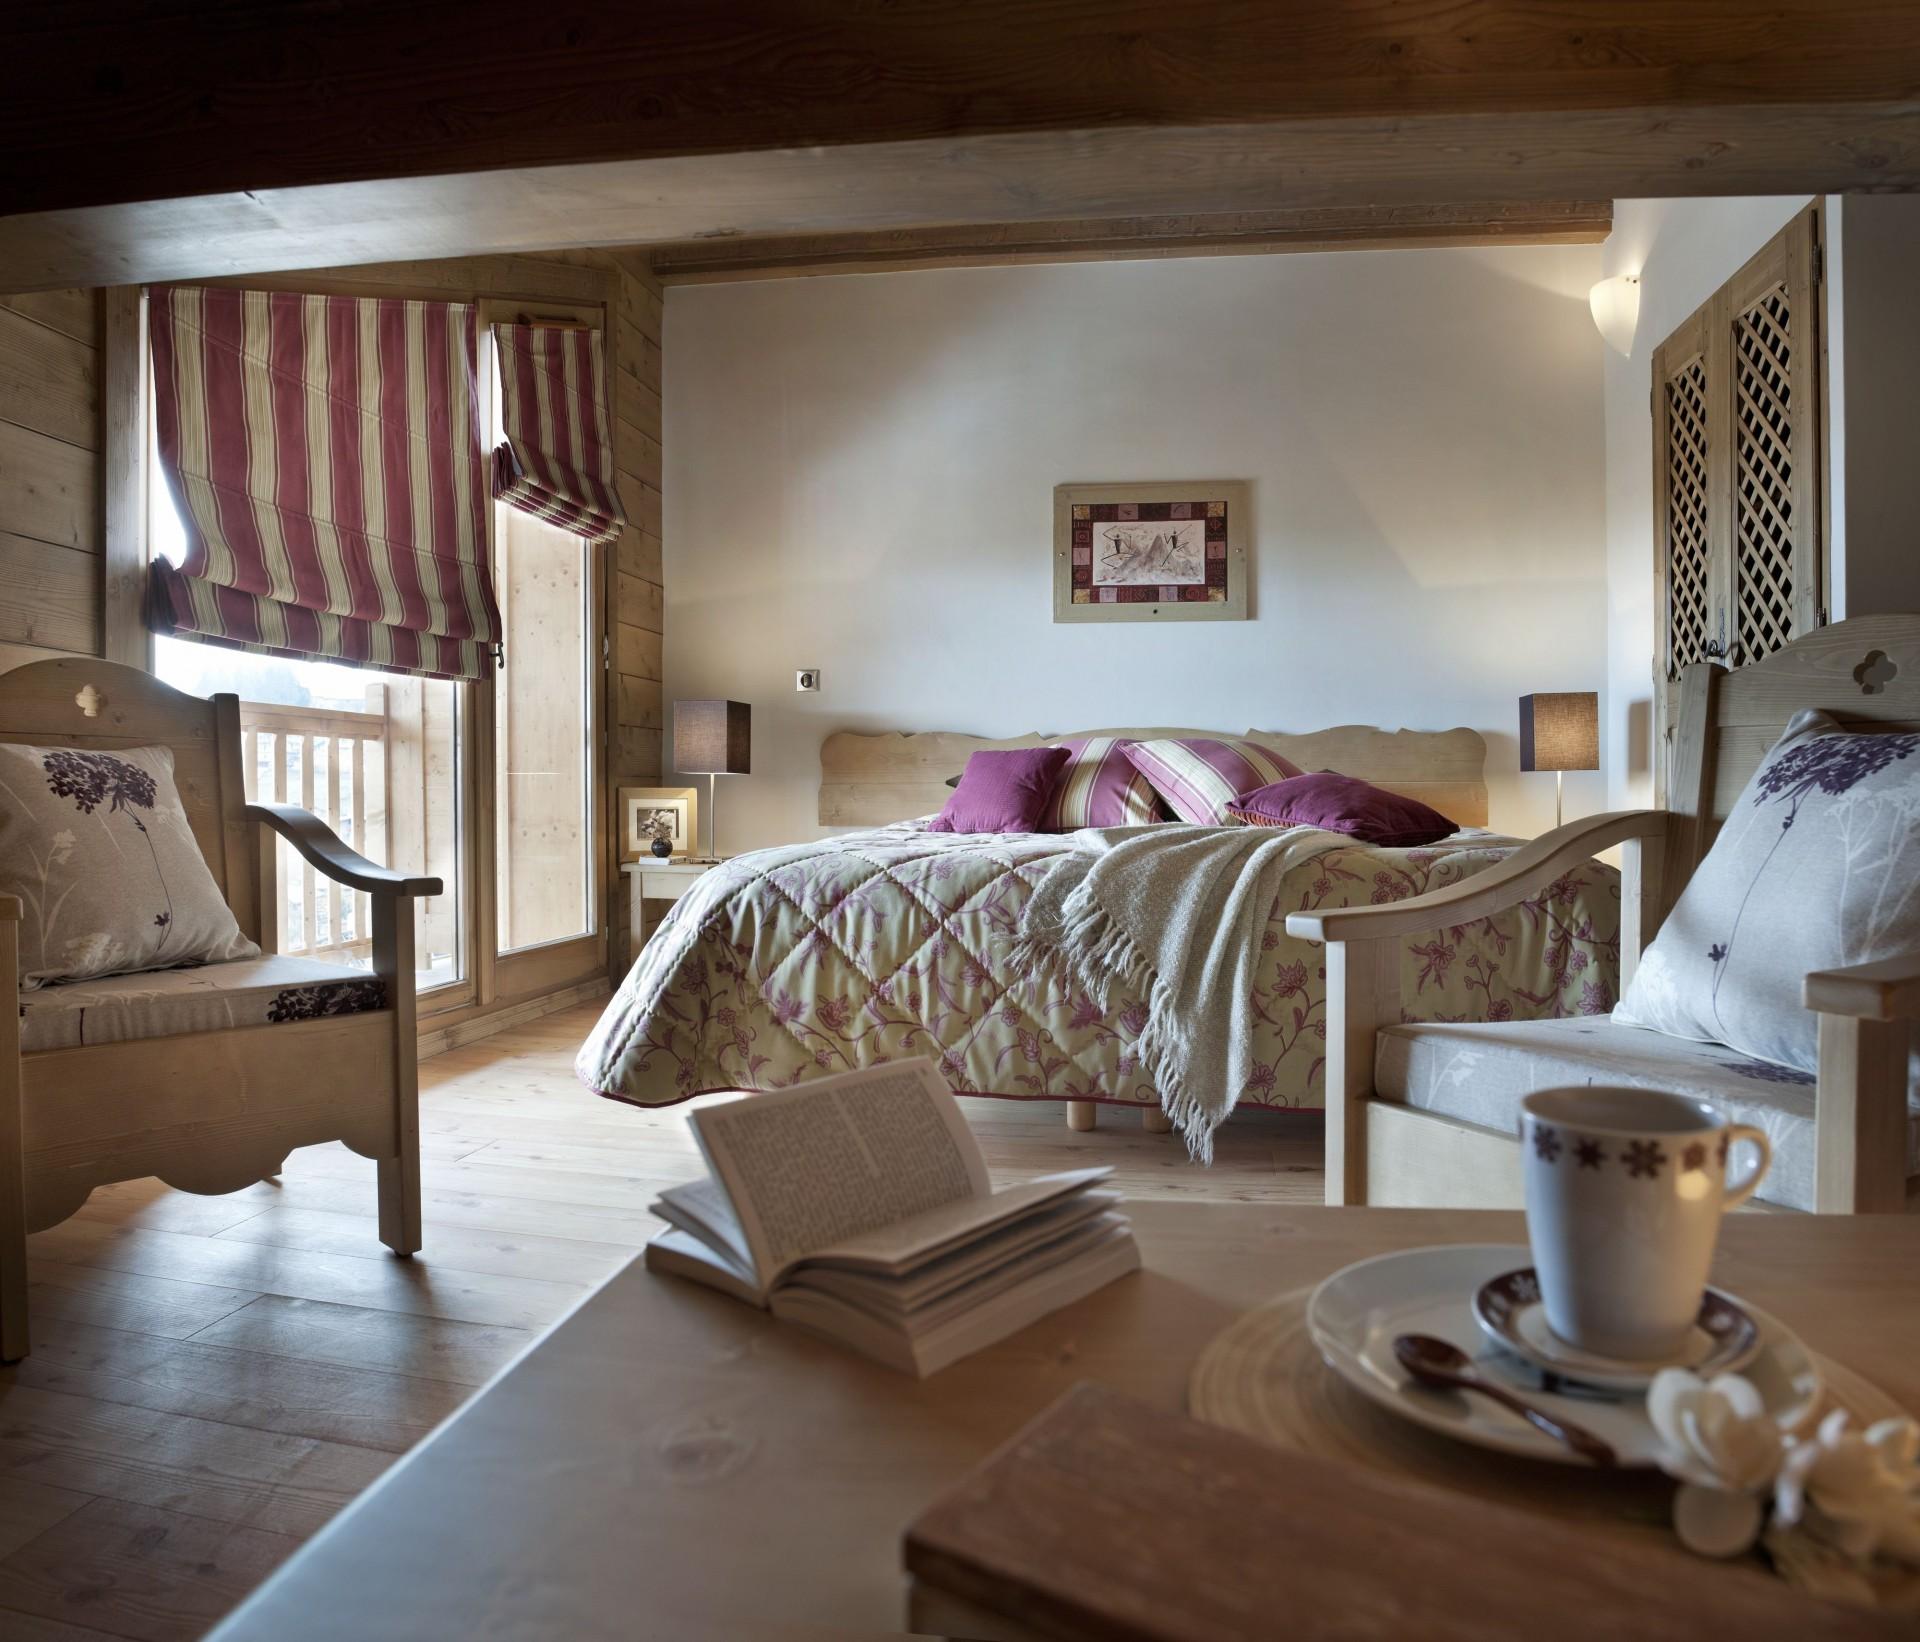 Les Carroz D'Araches Location Appartement Luxe Lilalite Chambre